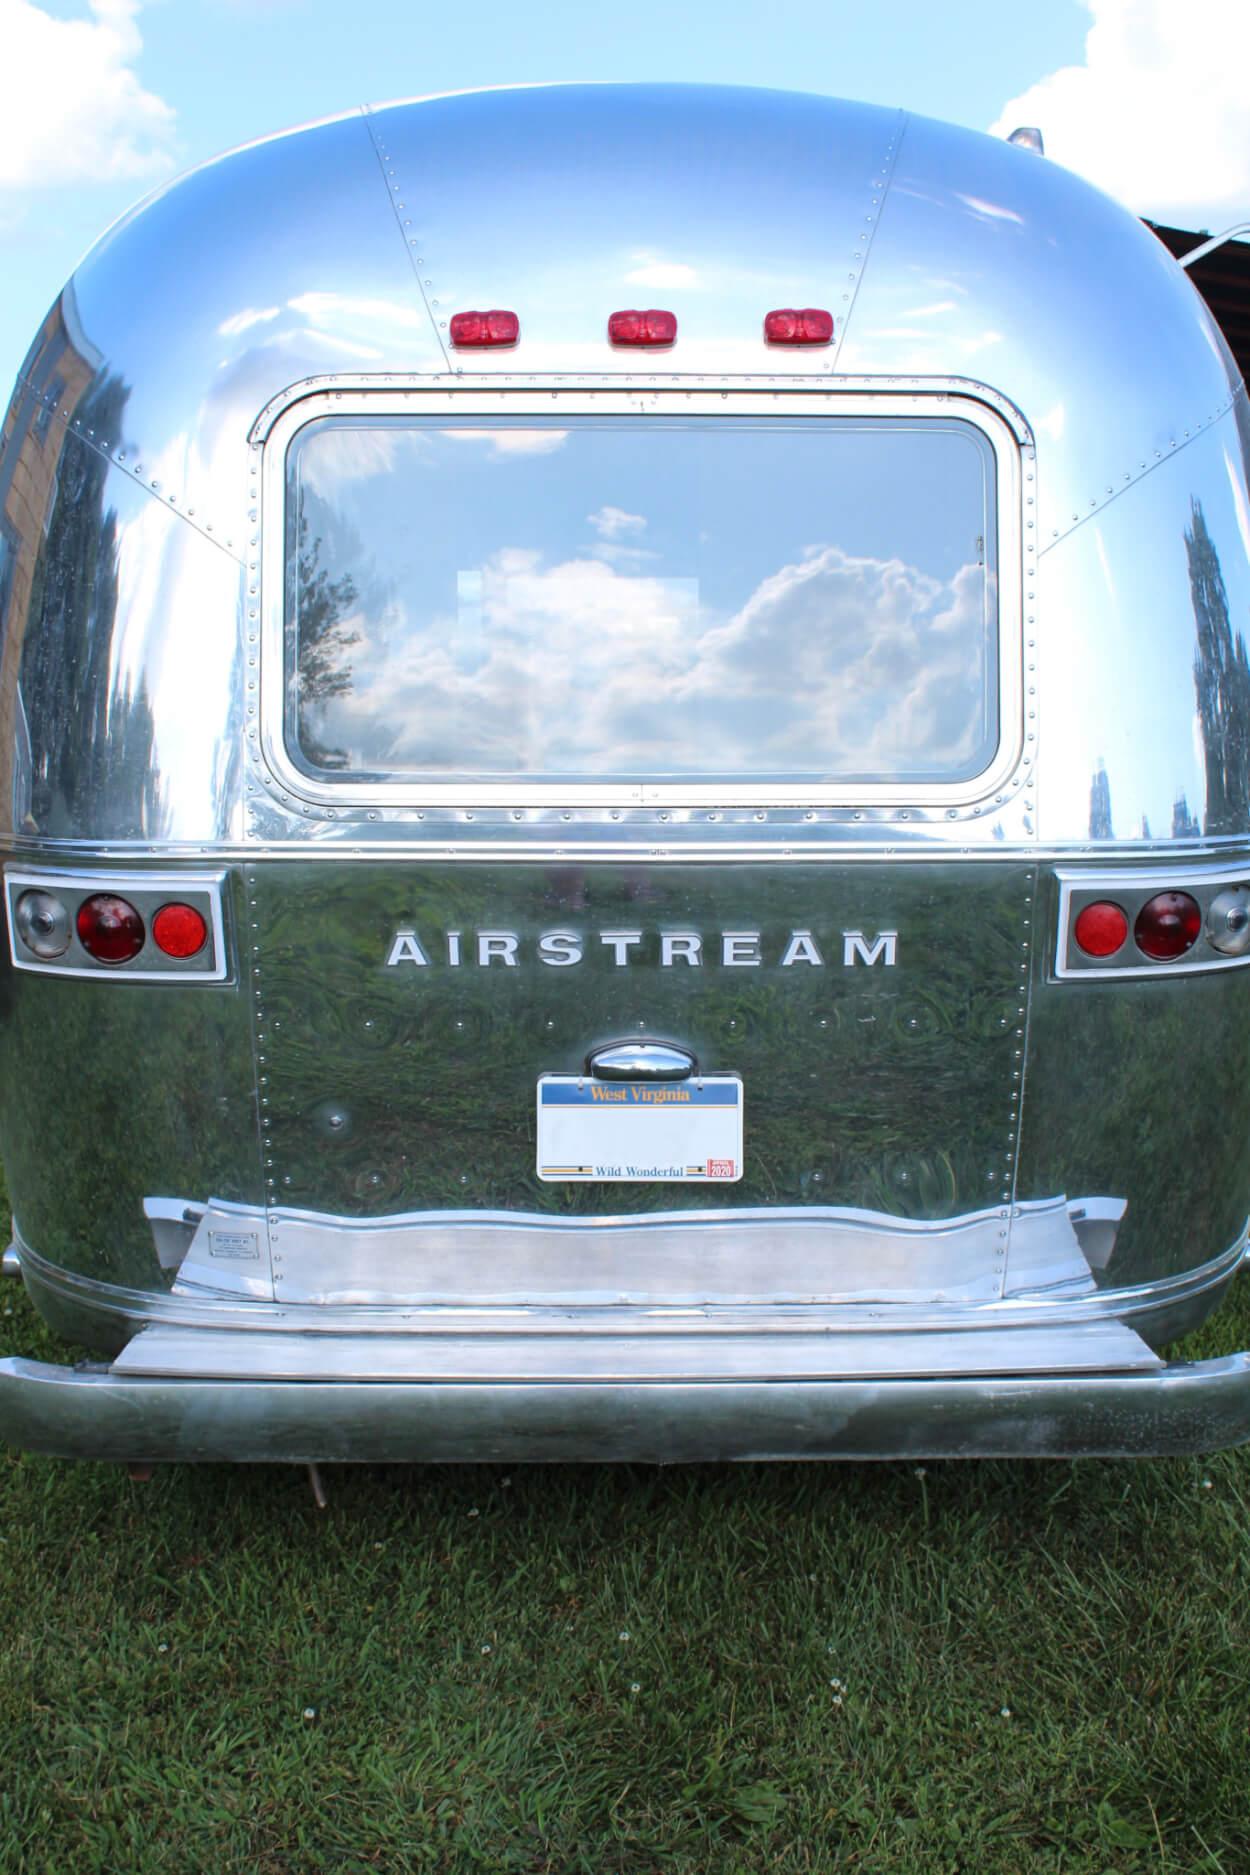 Mattox the Airstream2